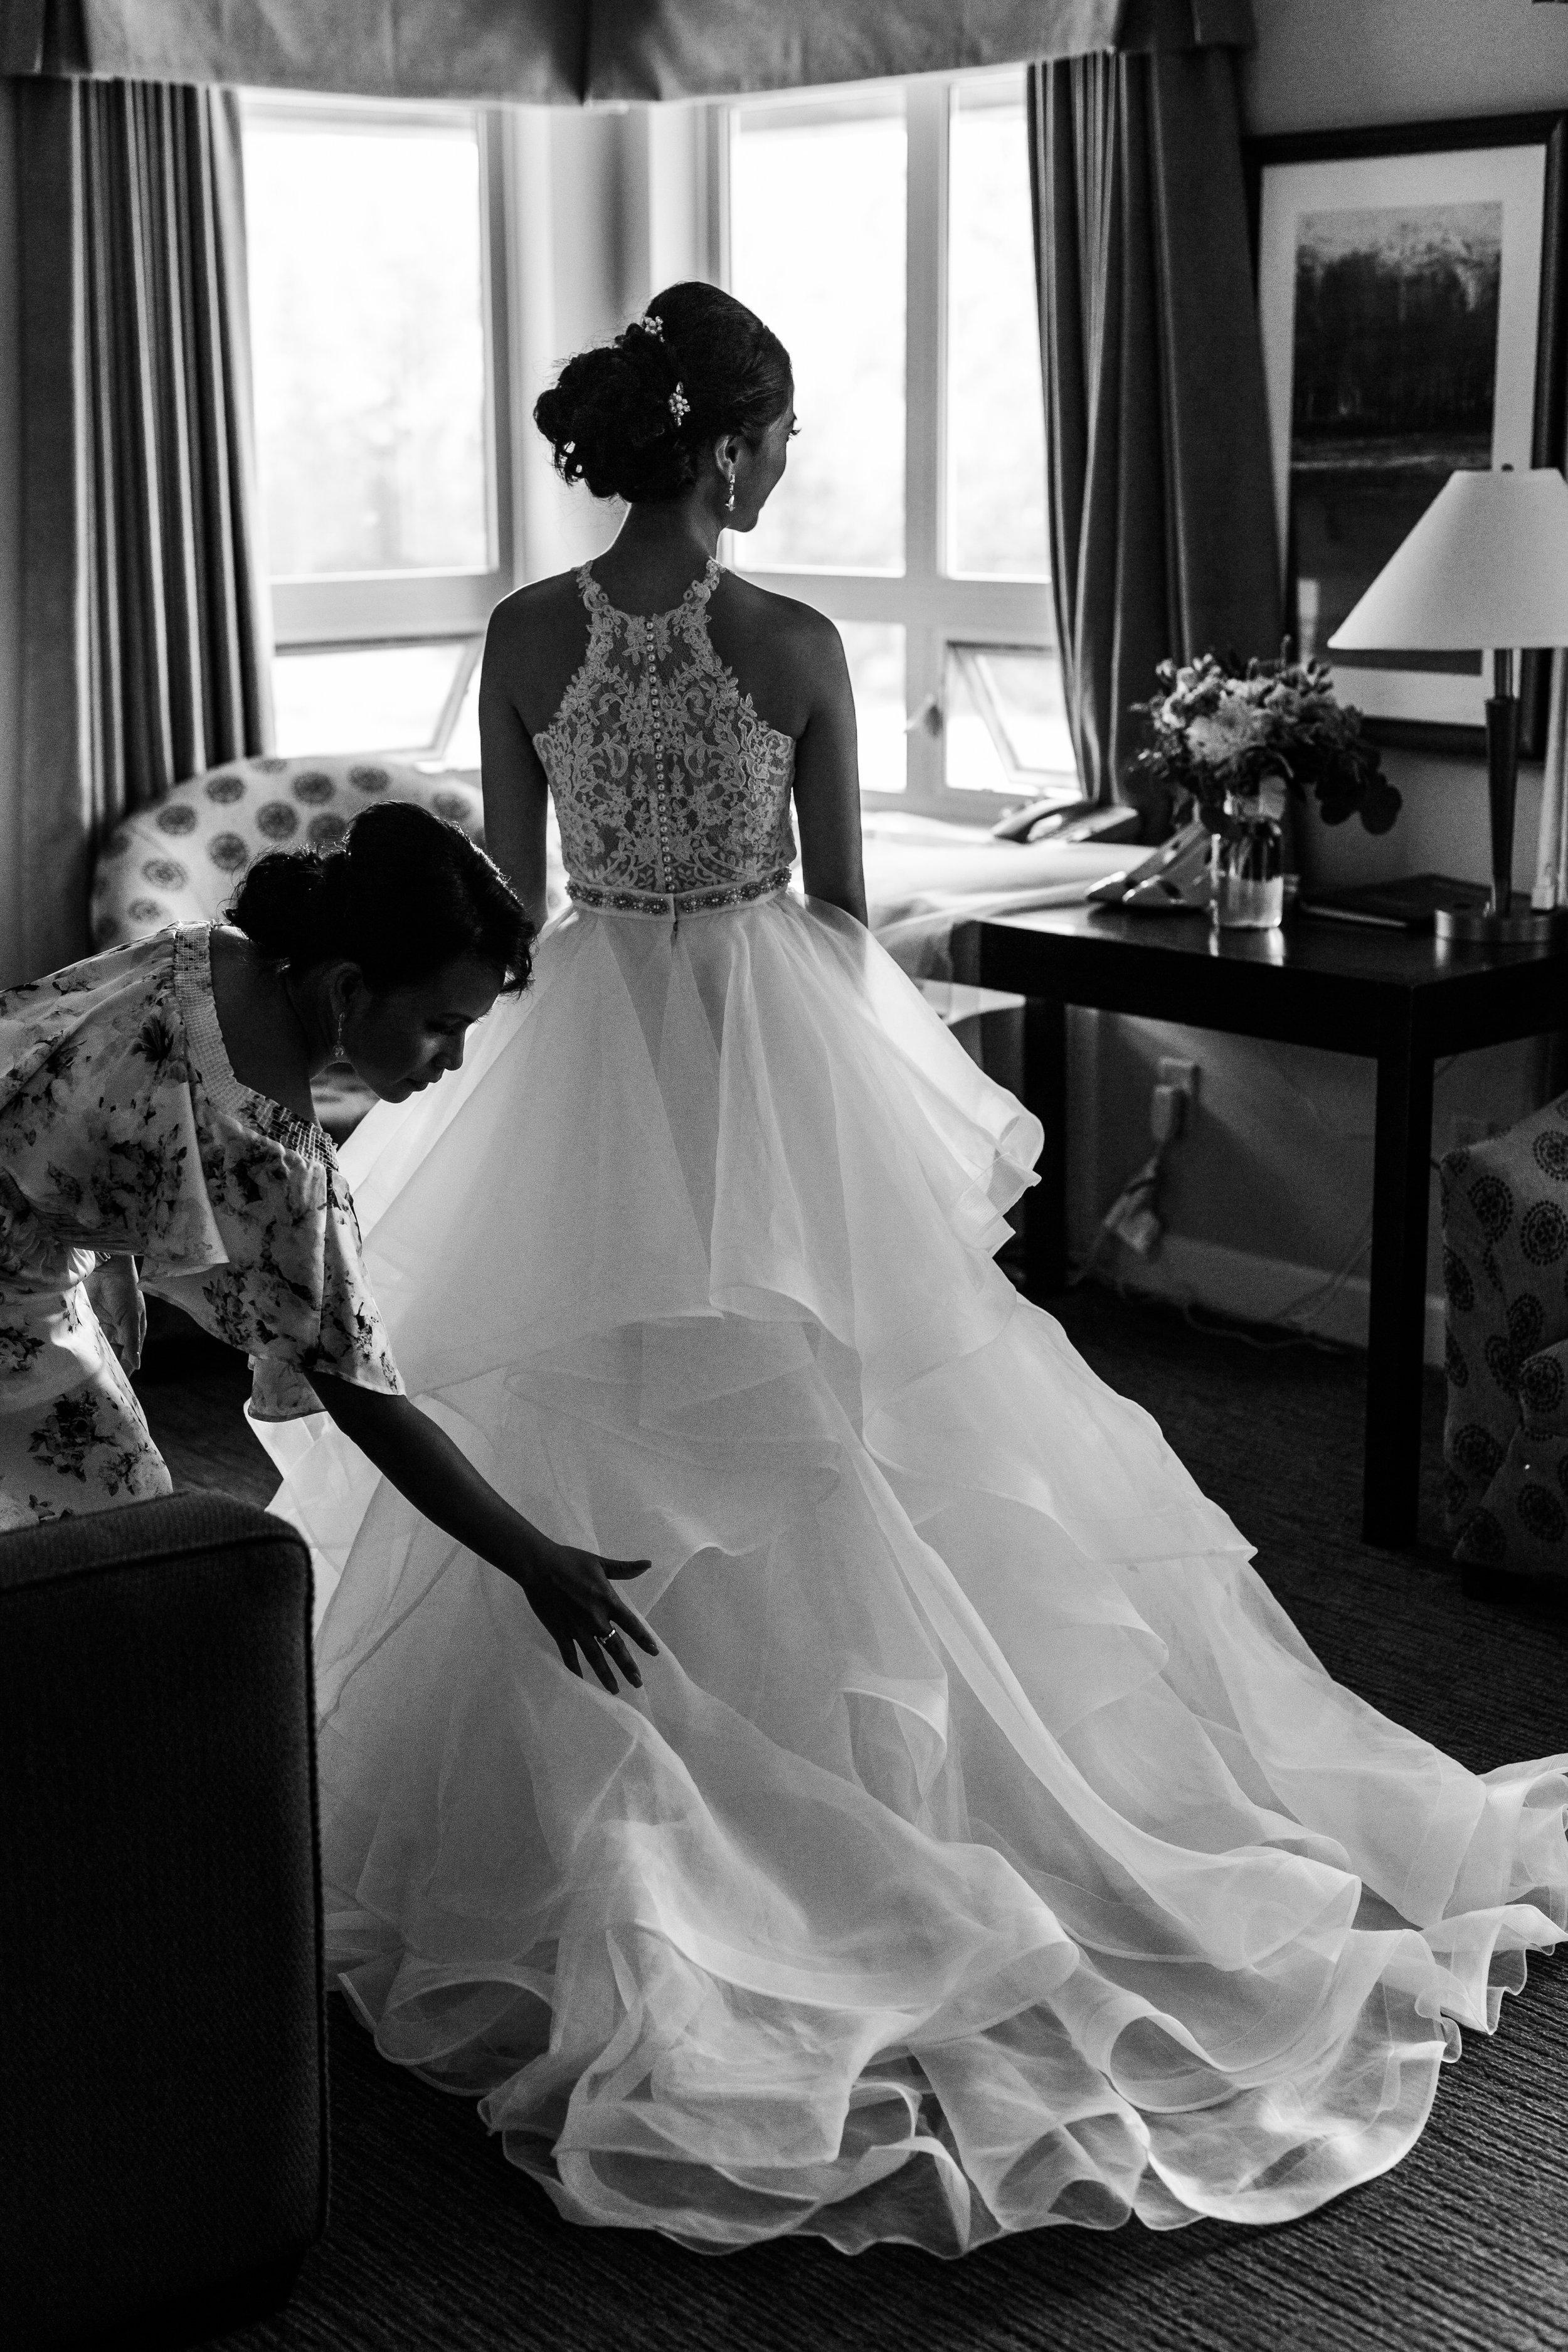 Squamish Wedding Photographer - Sea to Sky Gondola Wedding Photos -  Vancouver Wedding Photographer & Videographer - Sunshine Coast Wedding Photos - Sunshine Coast Wedding Photographer - Jennifer Picard Photography